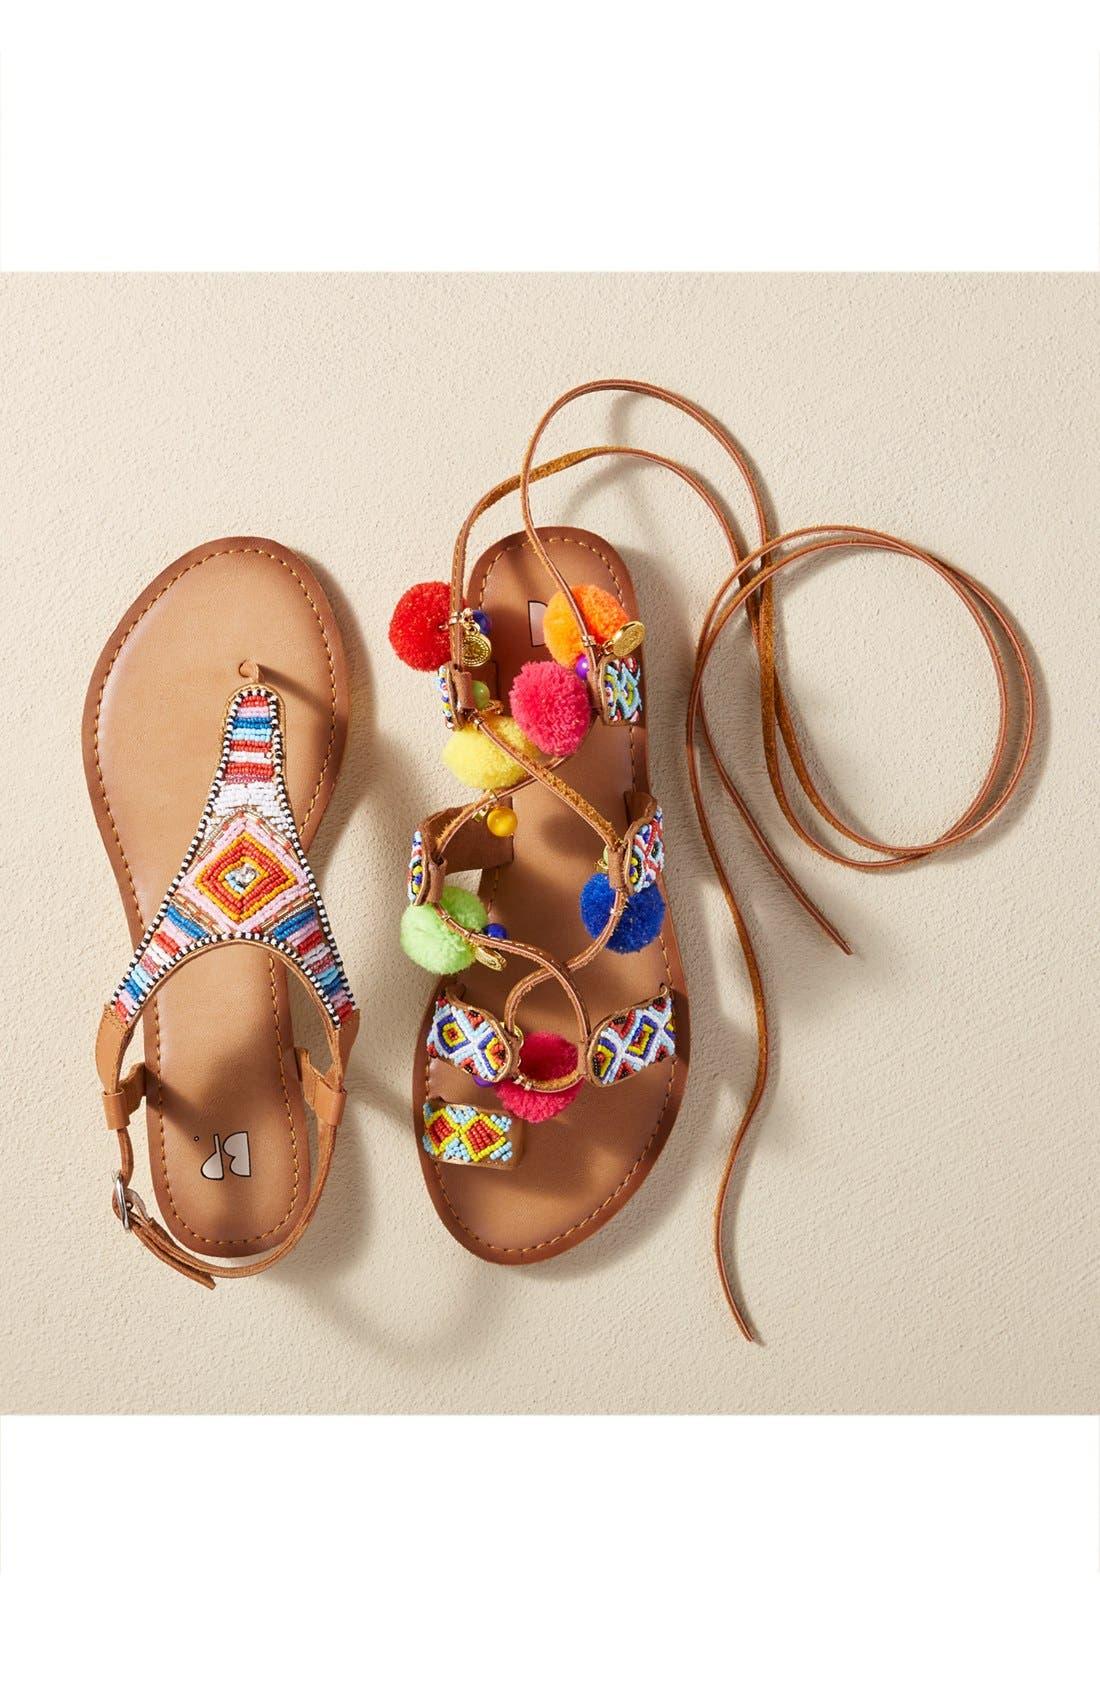 Zandra Beaded V-Strap Sandal,                             Alternate thumbnail 5, color,                             200